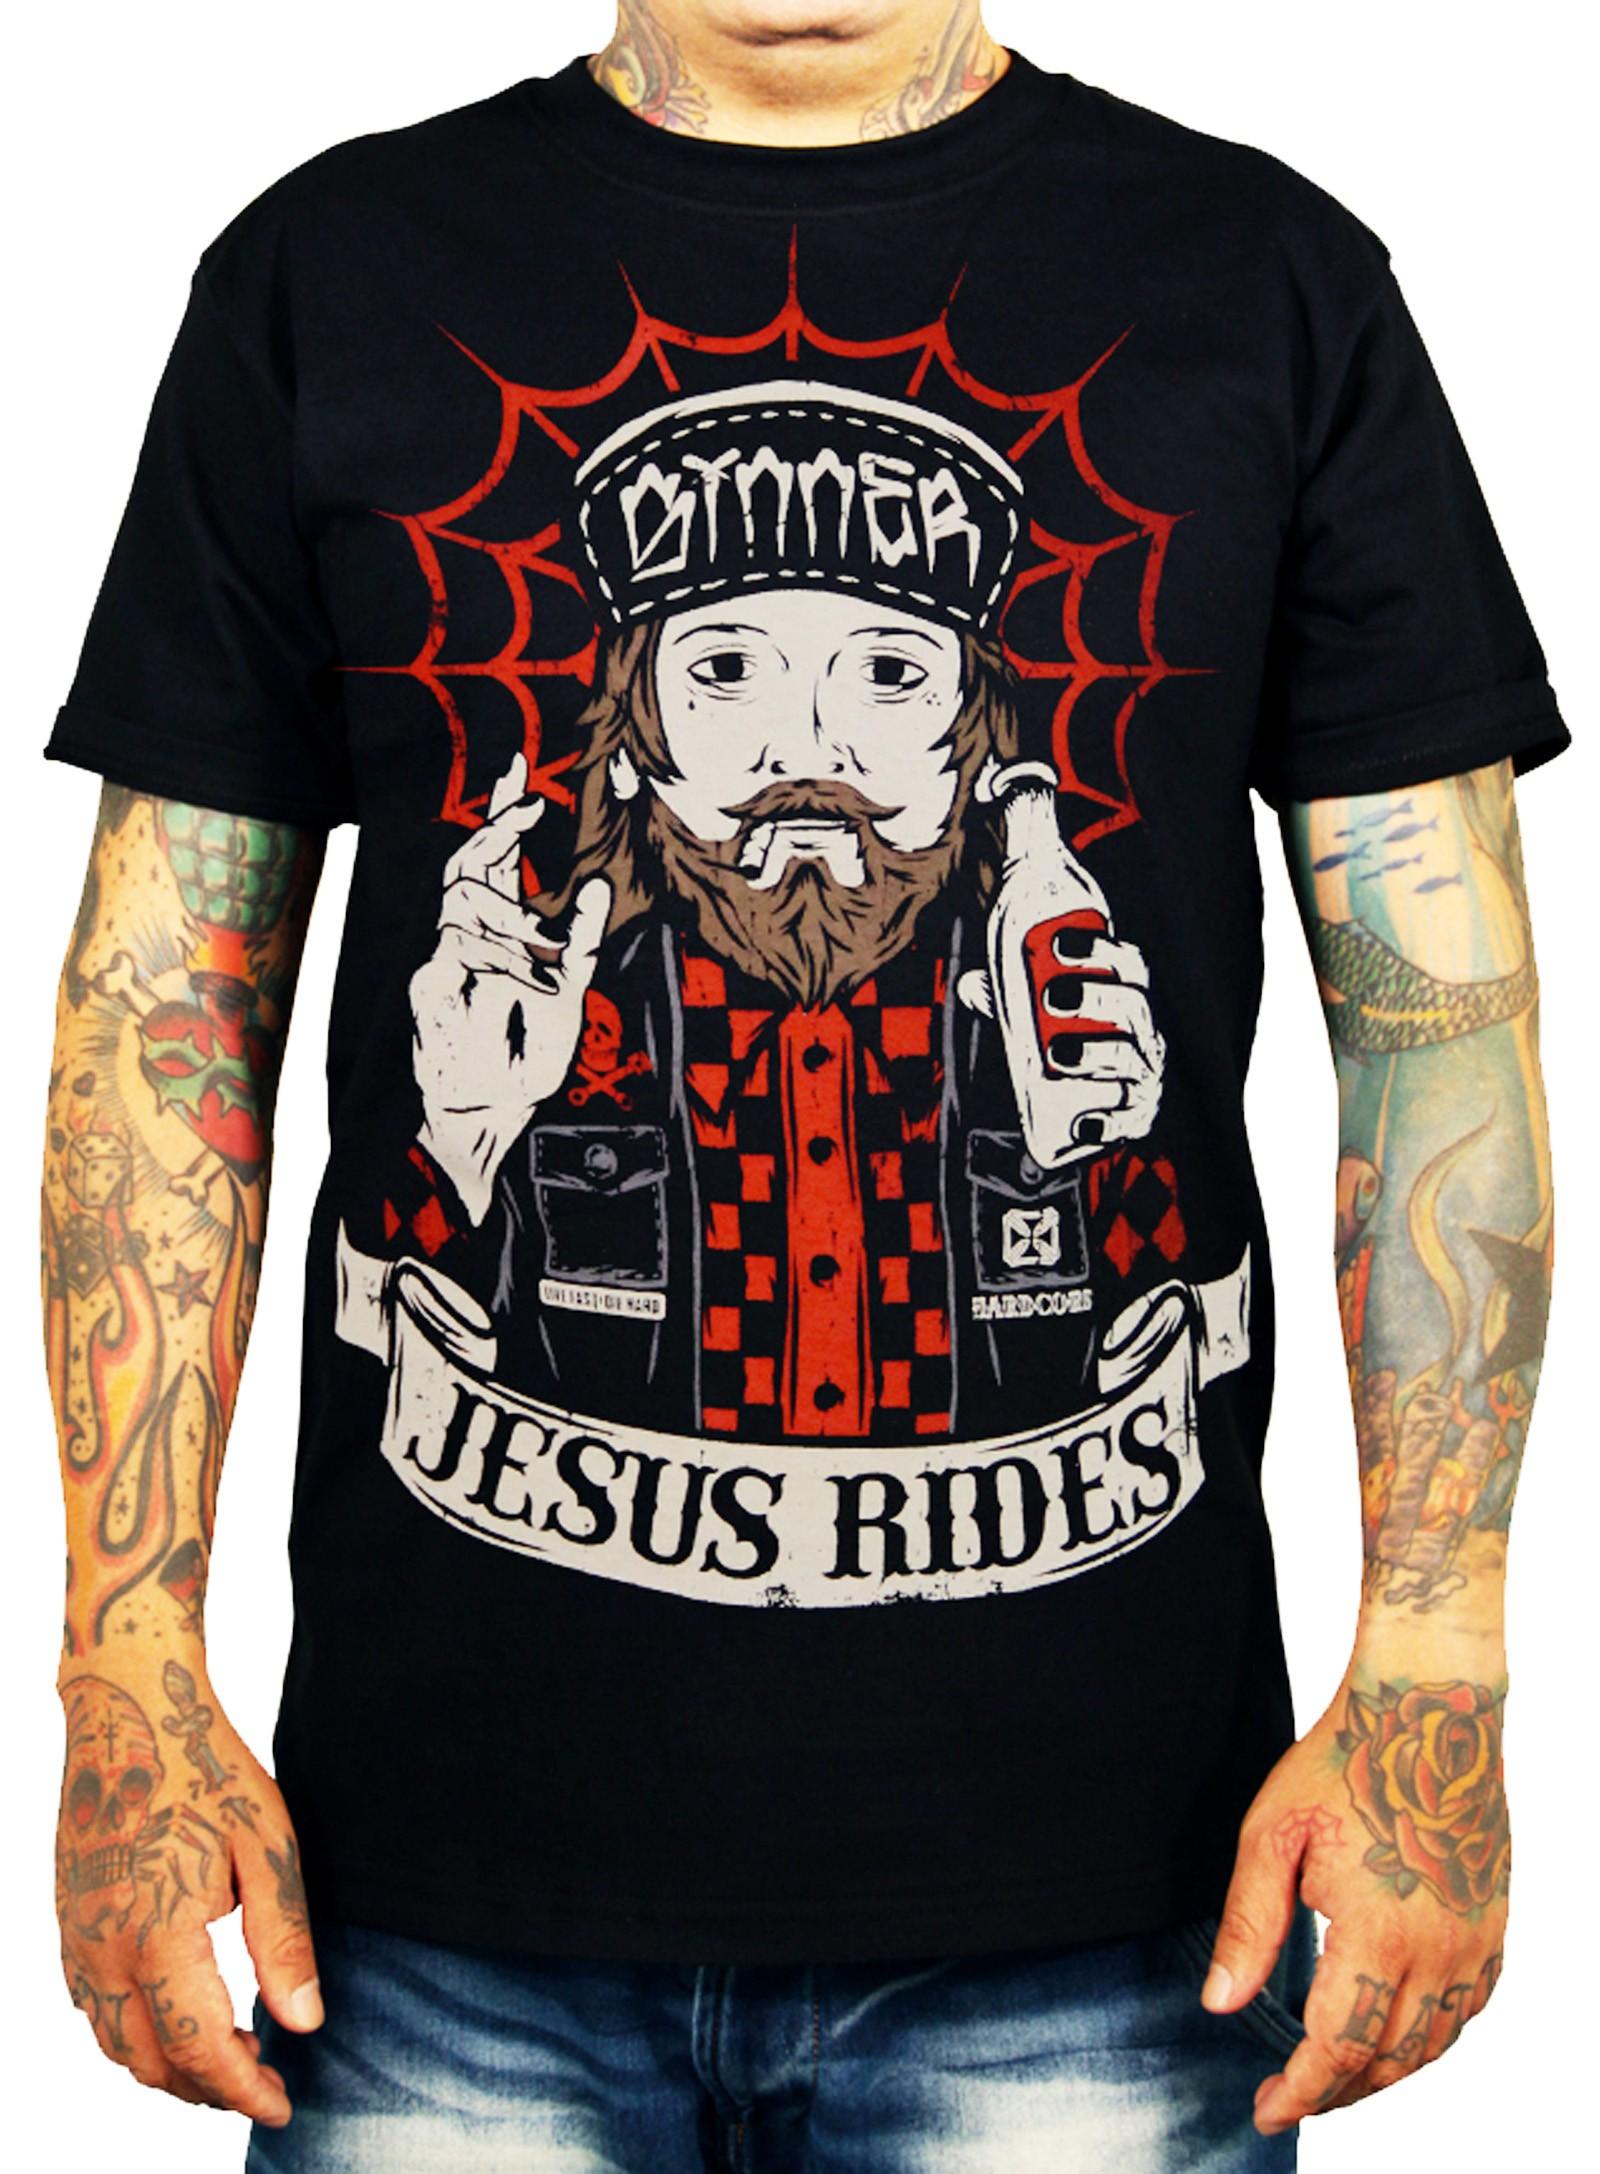 La Marca Del Diablo - Jesus Rides T-Shirt Front